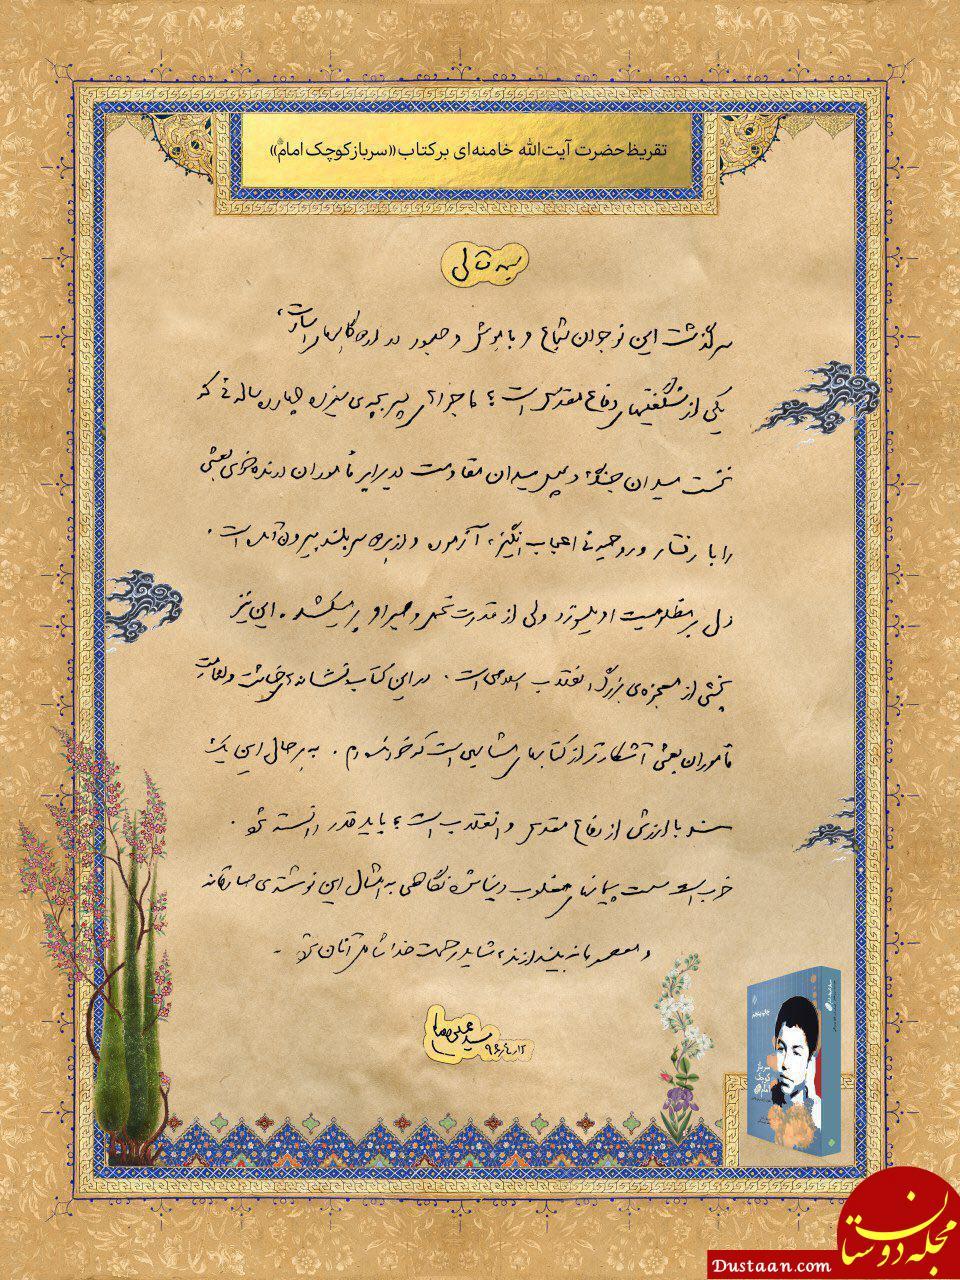 www.dustaan.com تقریظ رهبر انقلاب بر کتاب «سرباز کوچک امام»